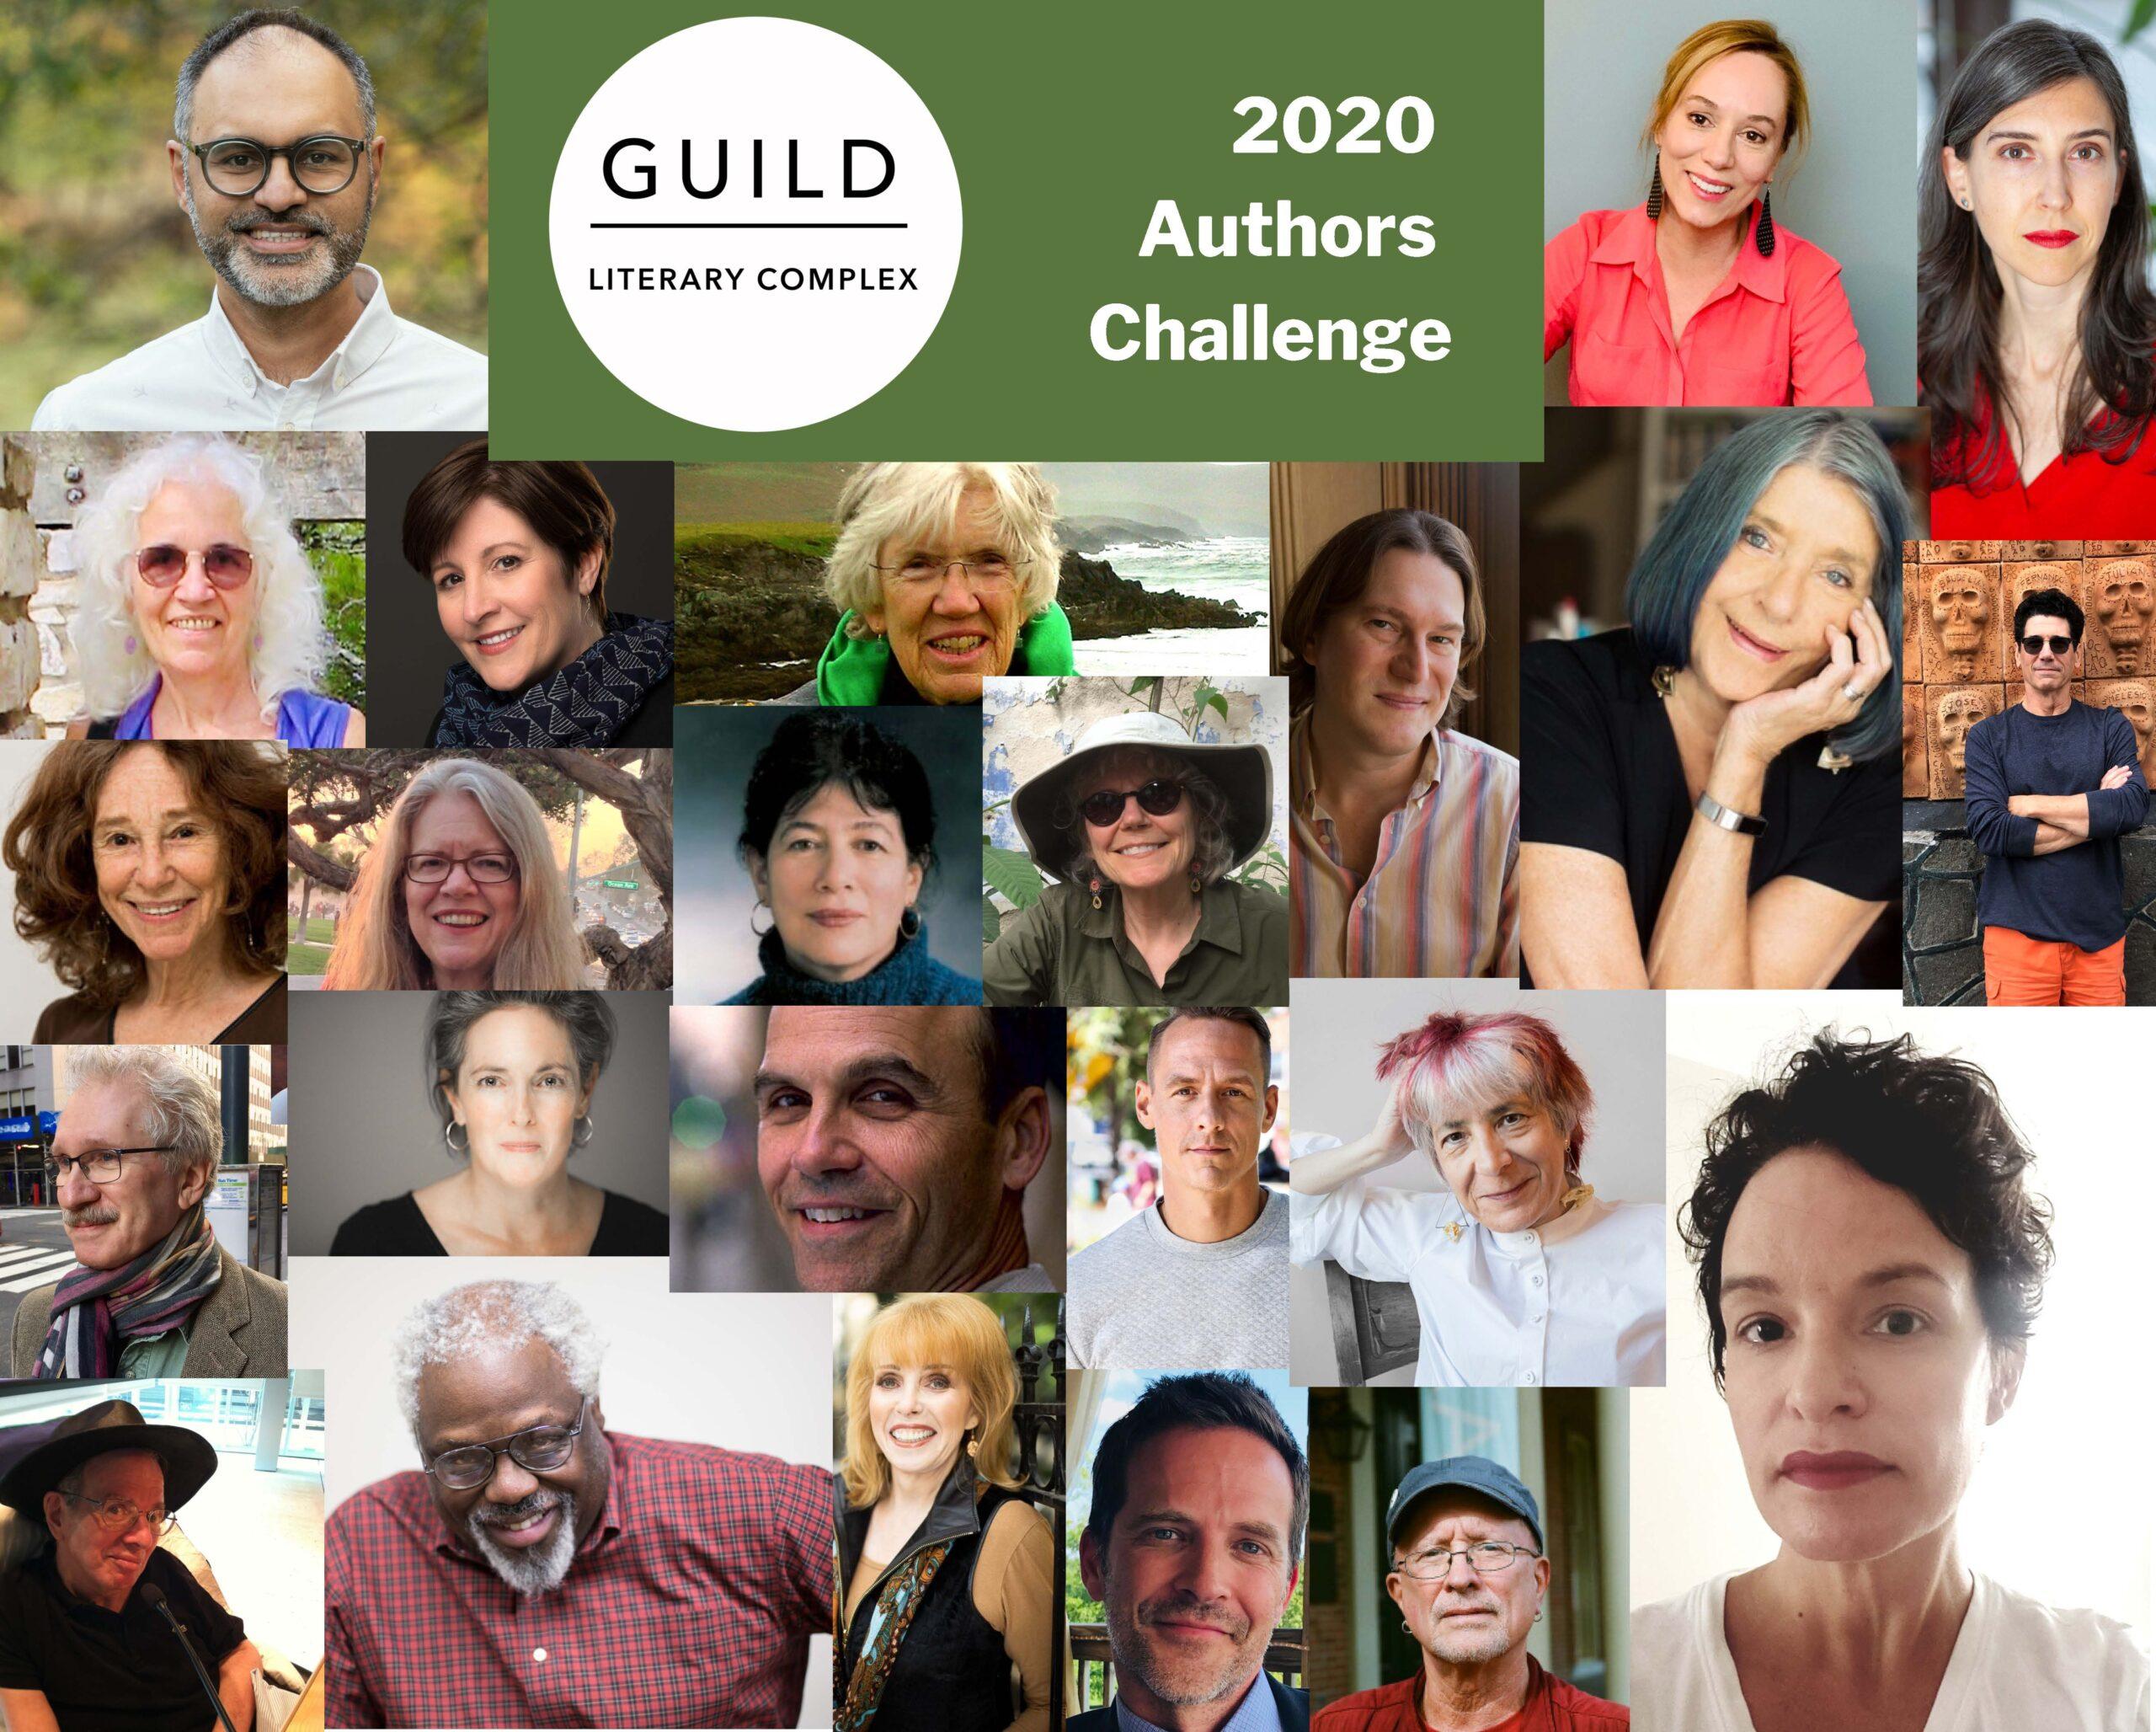 Guild Authors Challenge